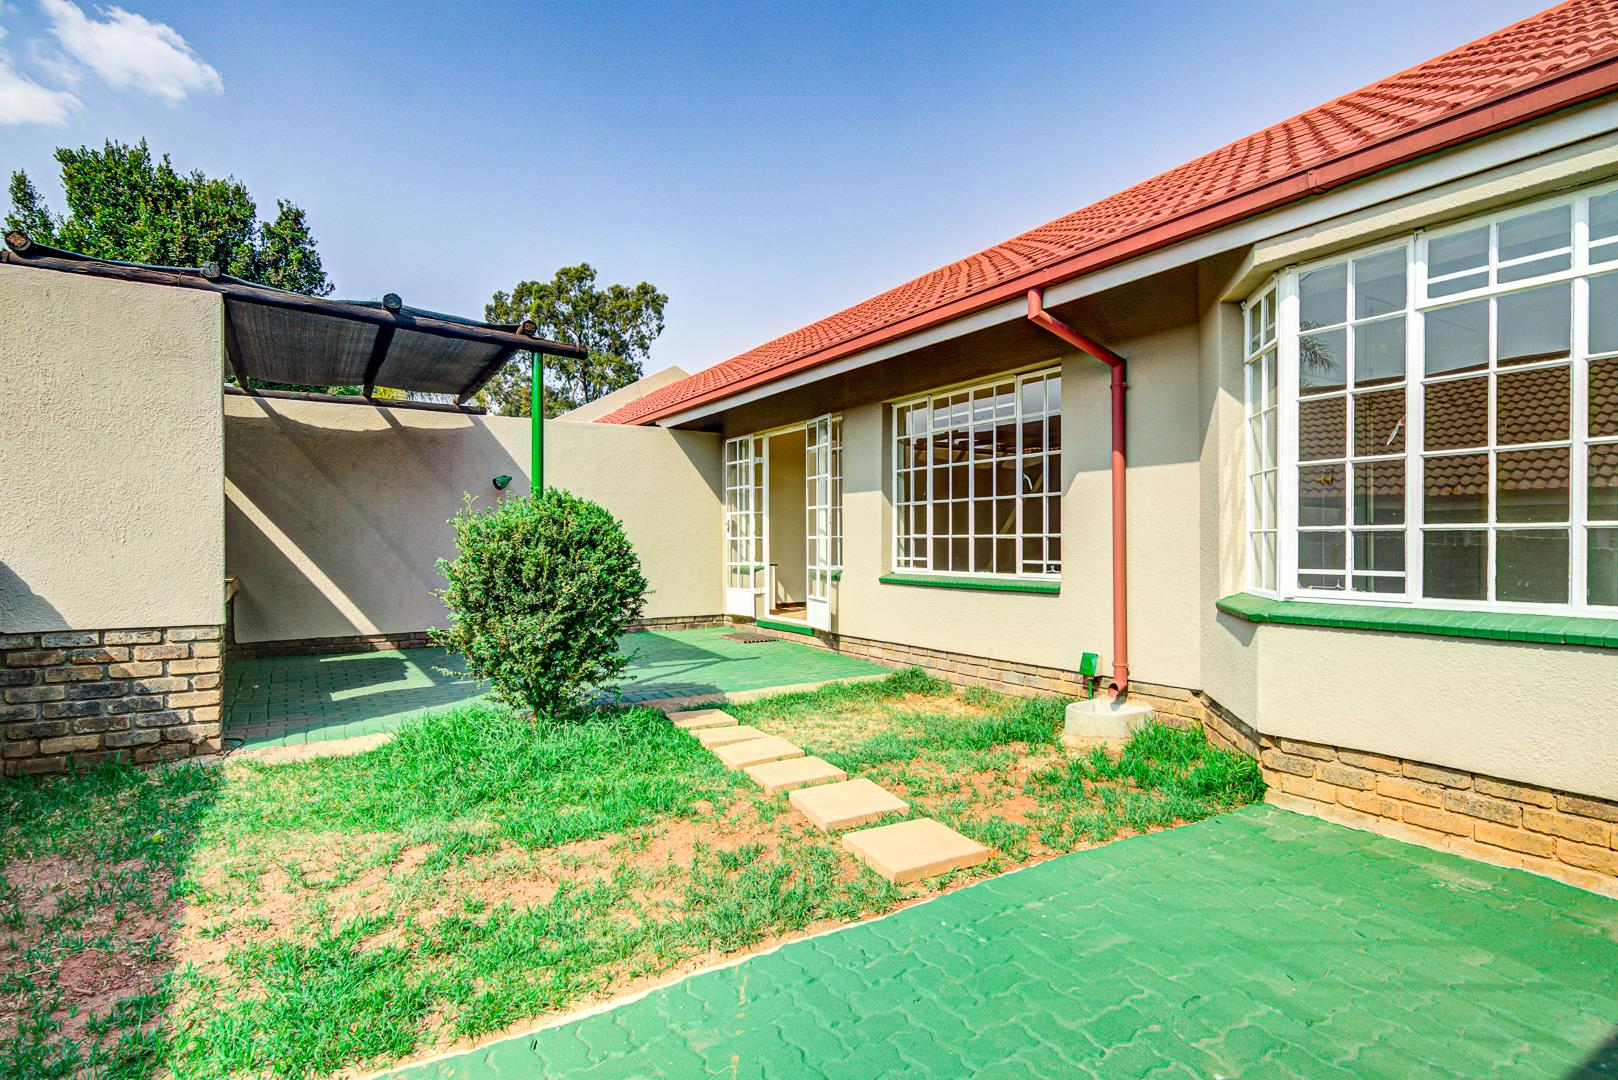 2 Bedroom Townhouse For Sale in Glen Marais